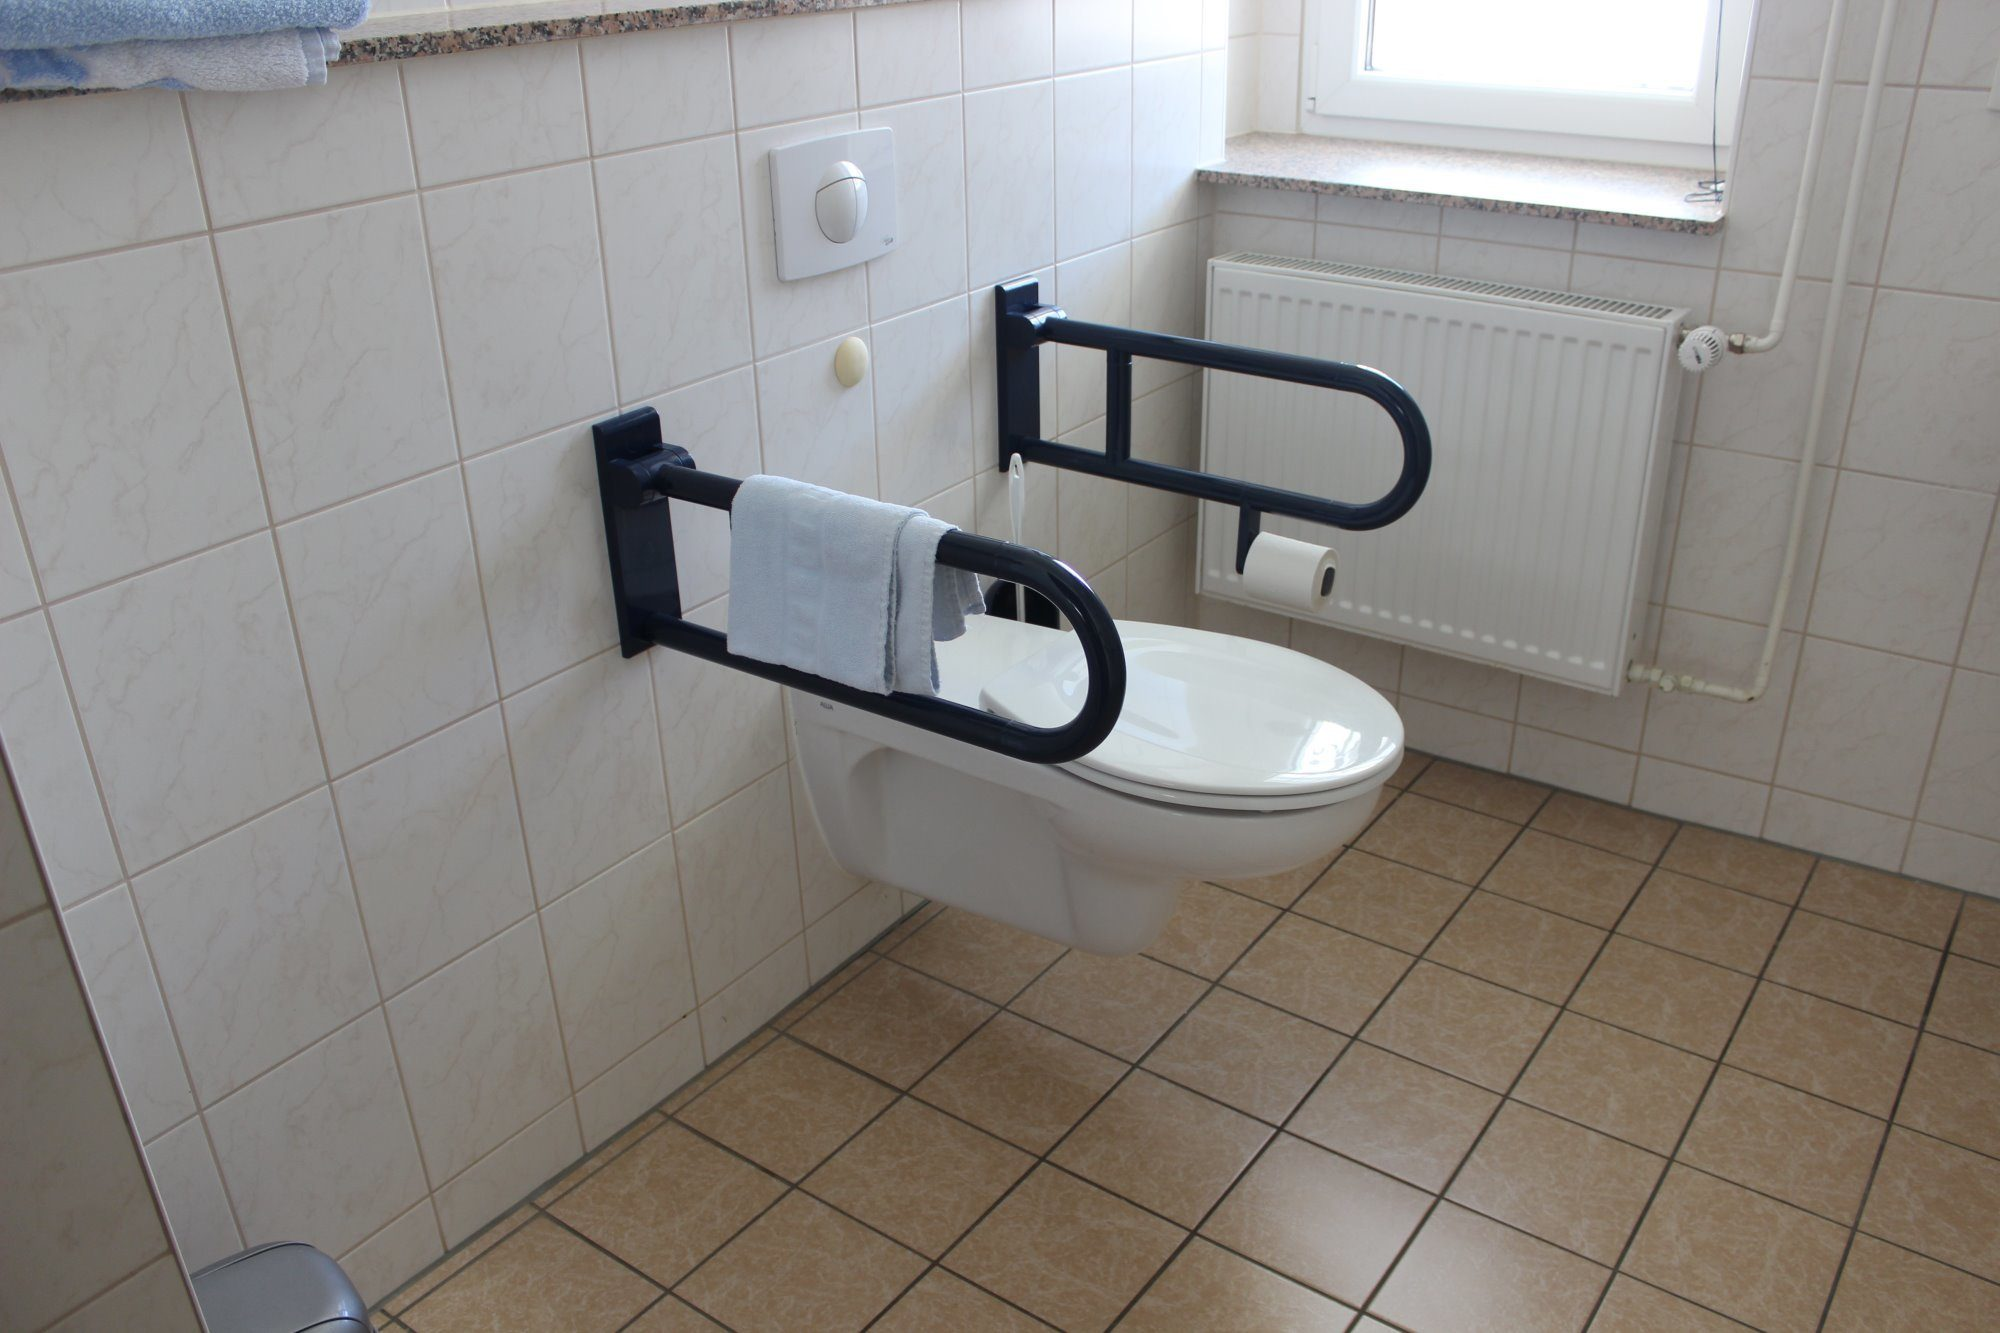 Toilette behindertengerecht